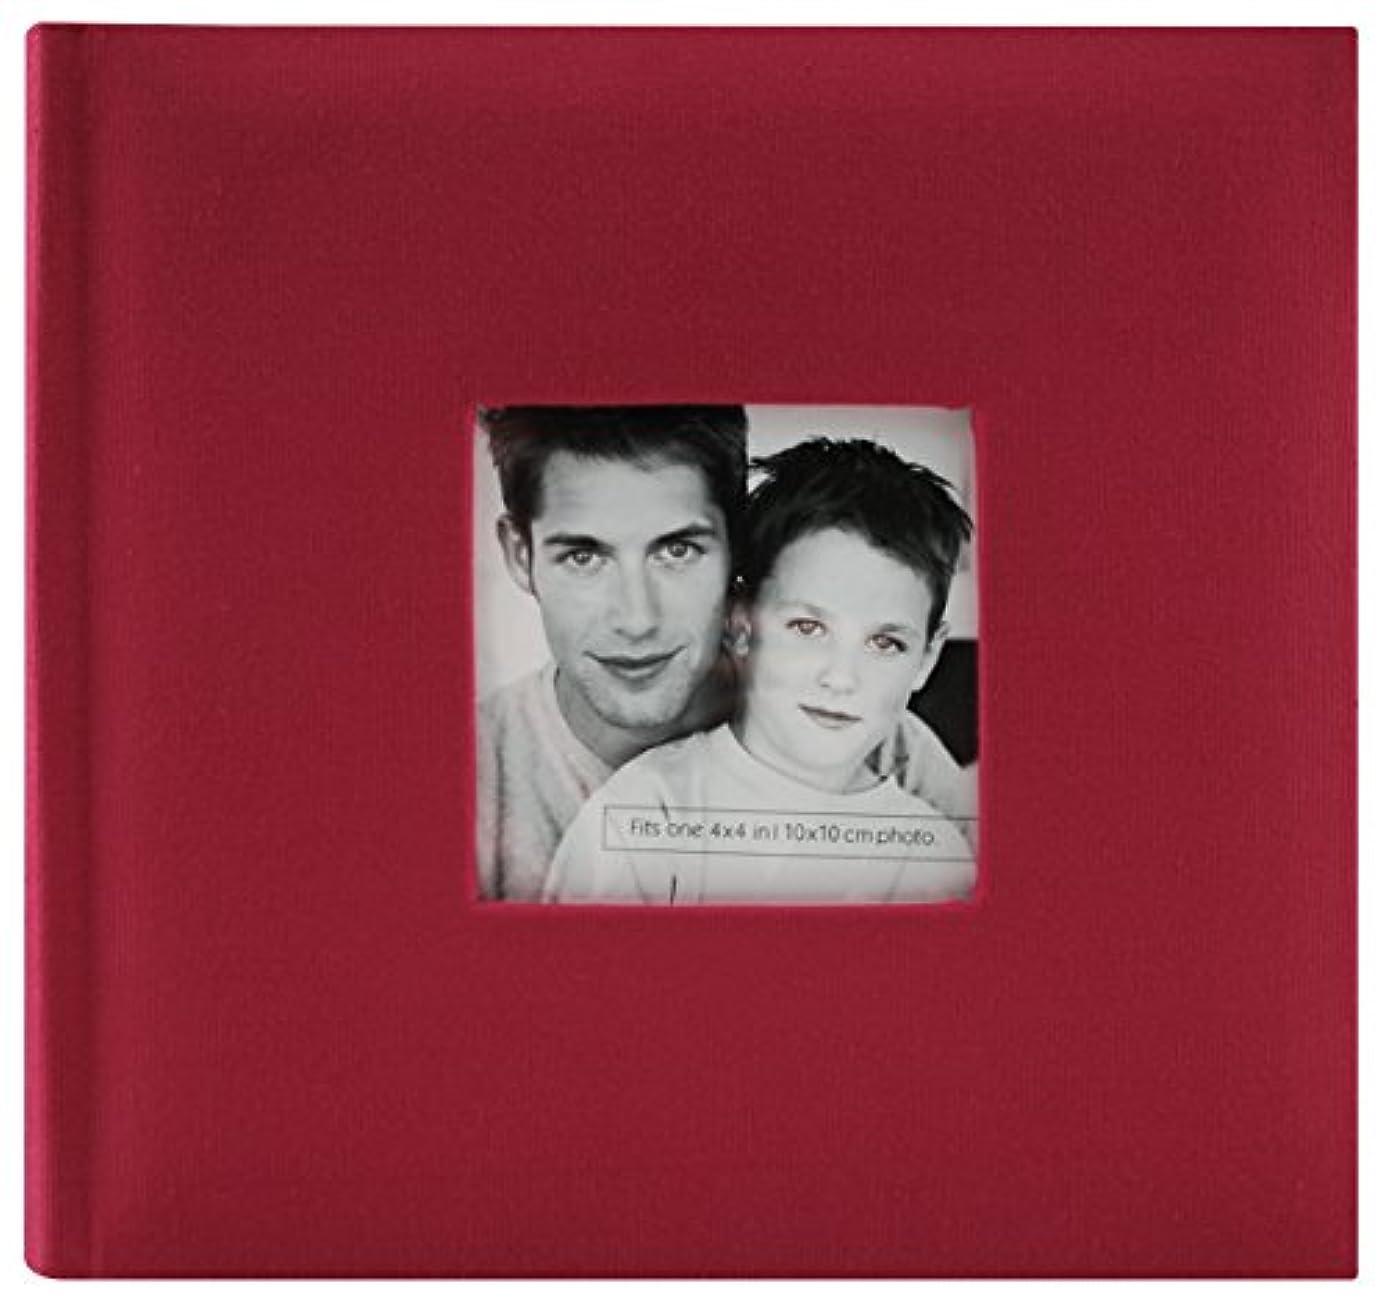 MCS Fashion Fabric 200 Pocket Album, Red (846513)